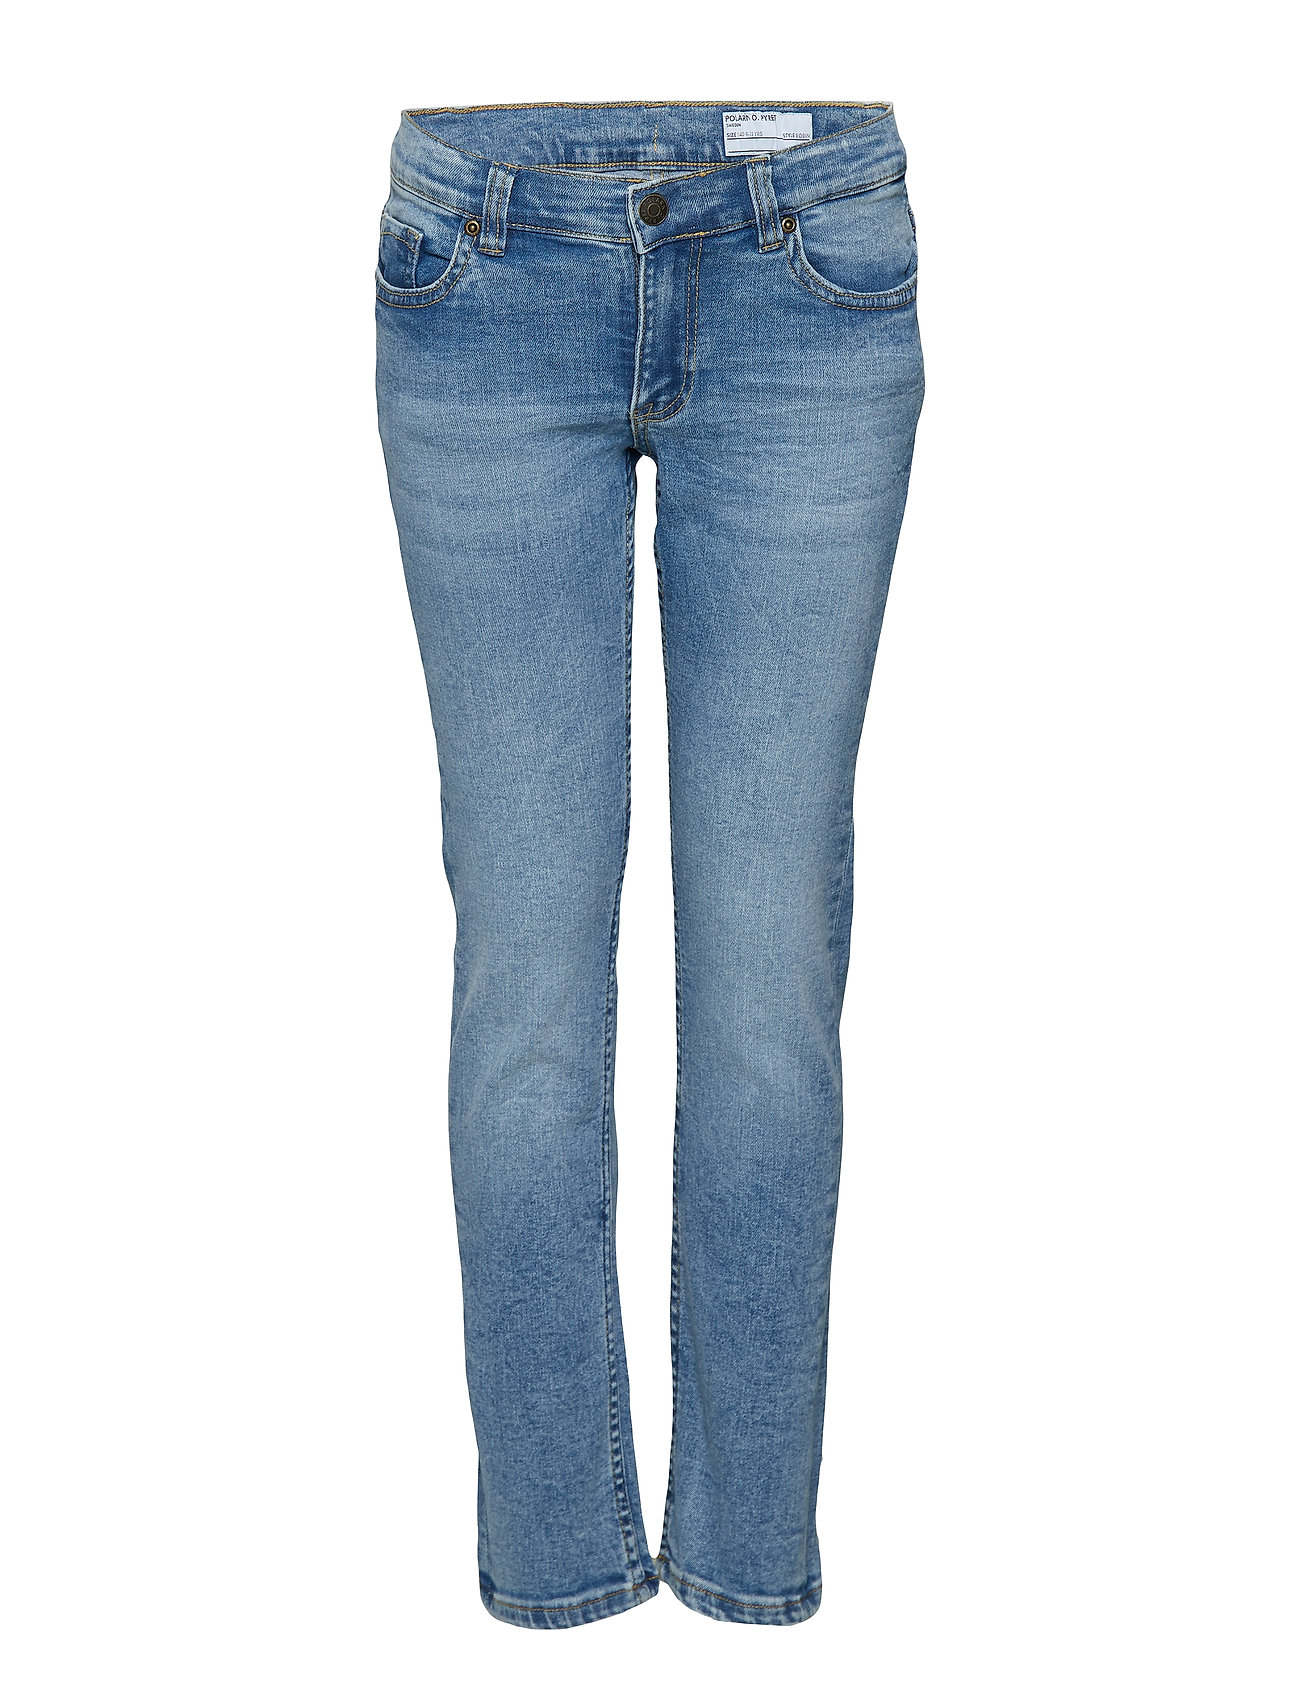 Polarn O. Pyret Jeans Slim School